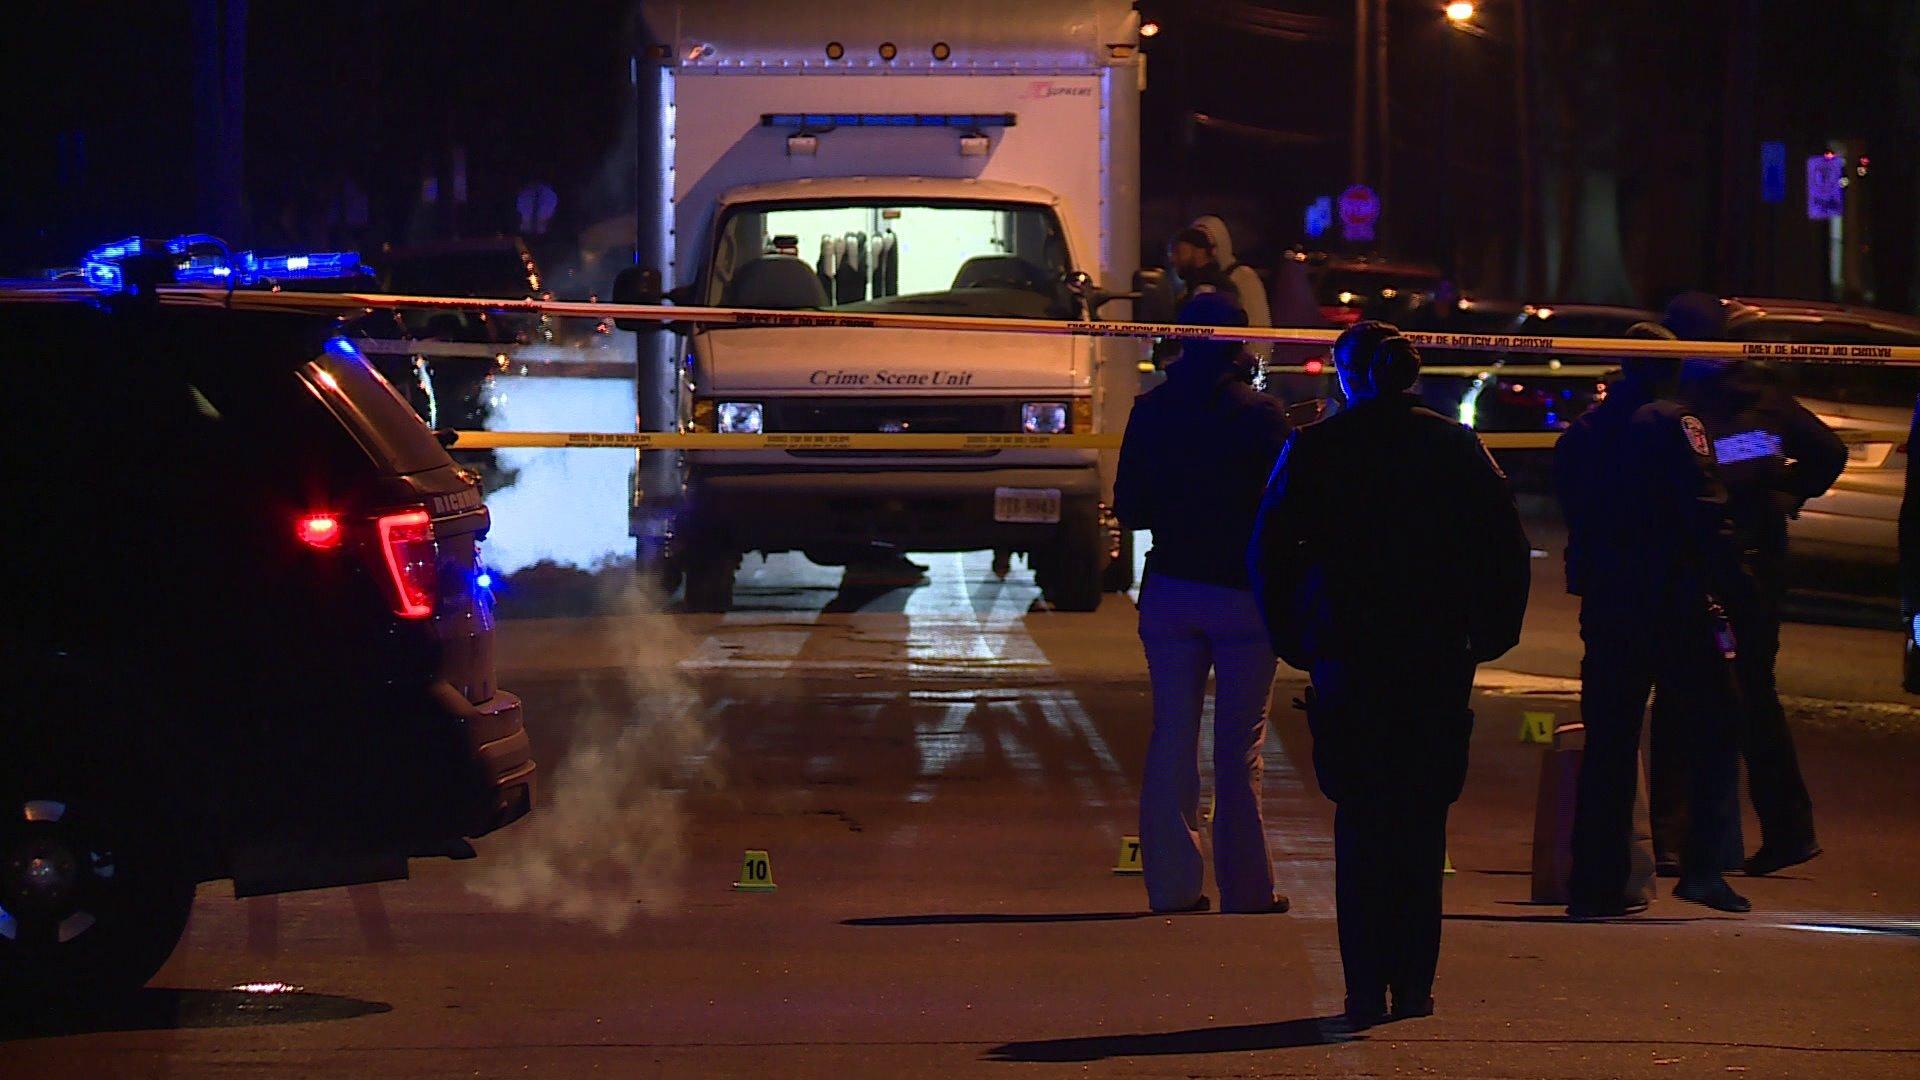 Photos: Police ID man killed in Richmondshooting